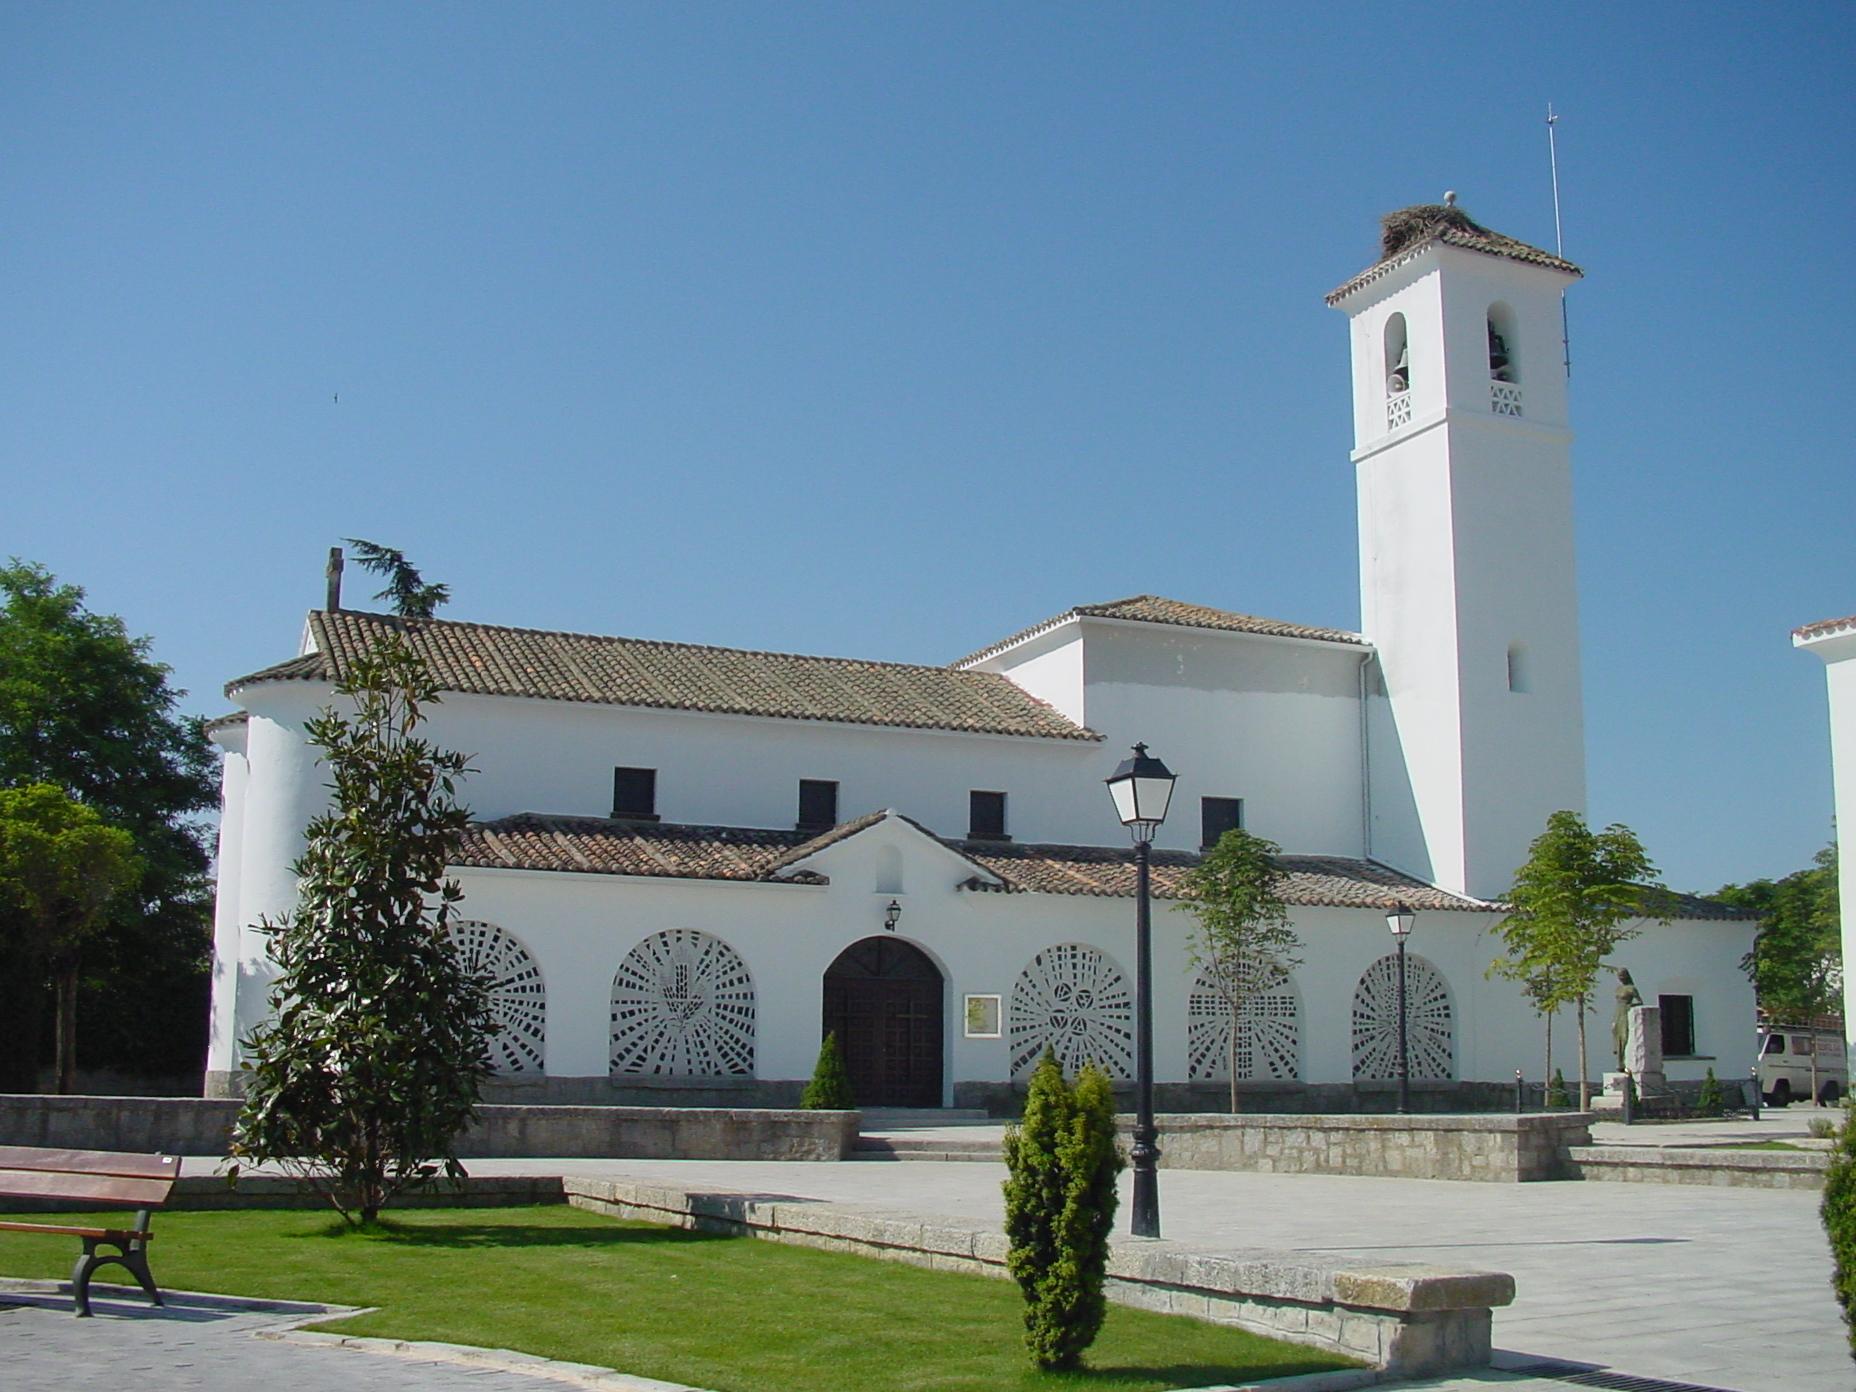 Iglesia en Villanueva de la Cañada